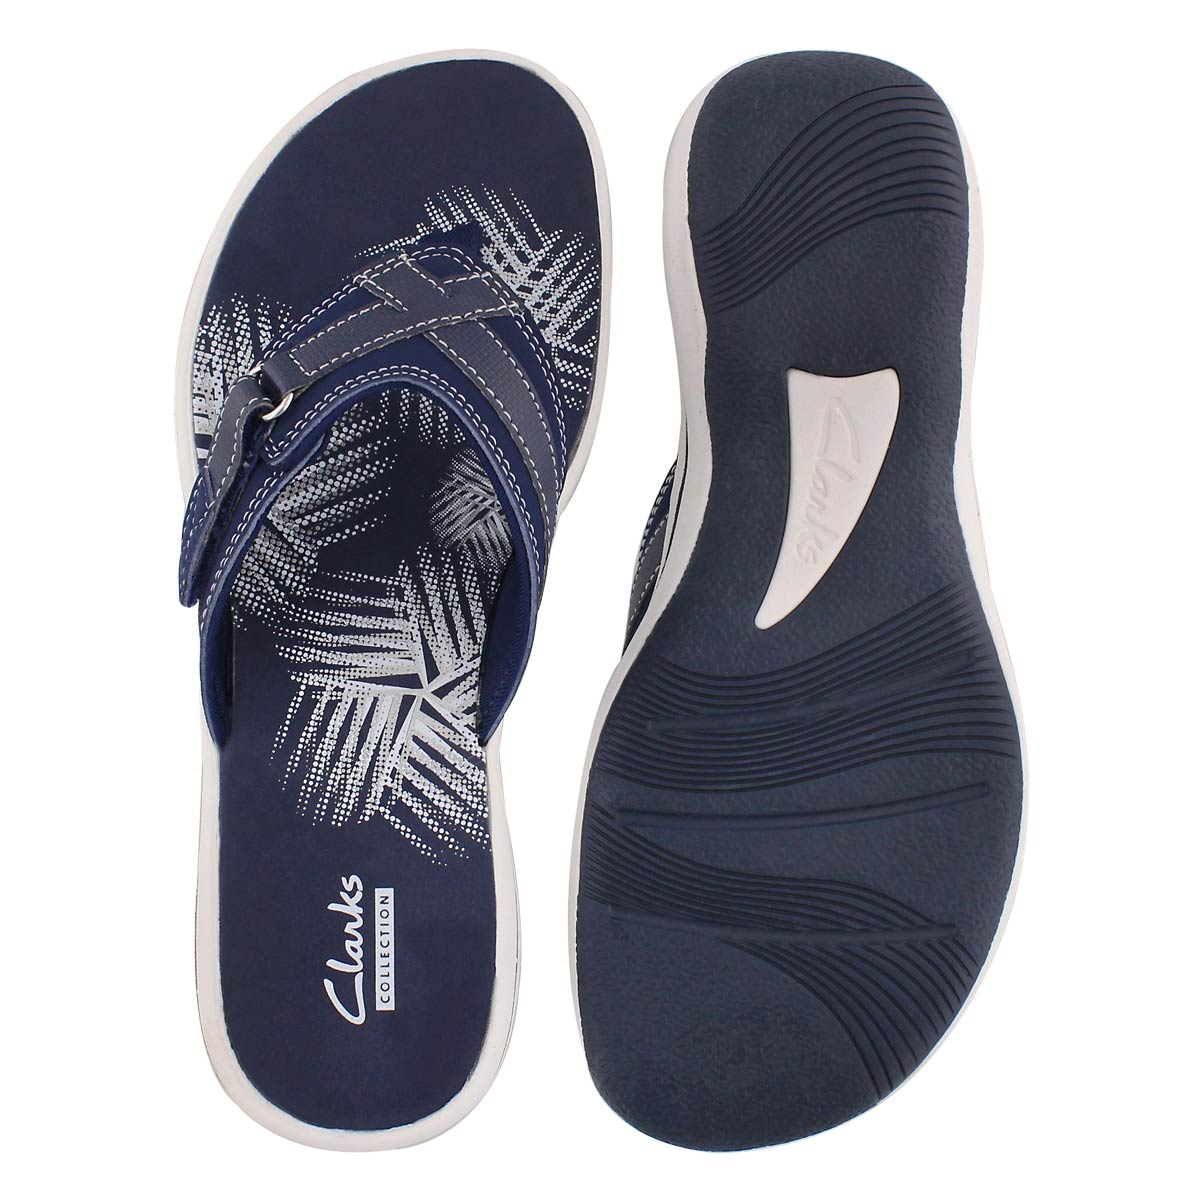 Lds Breeze Sea navy thong sandal